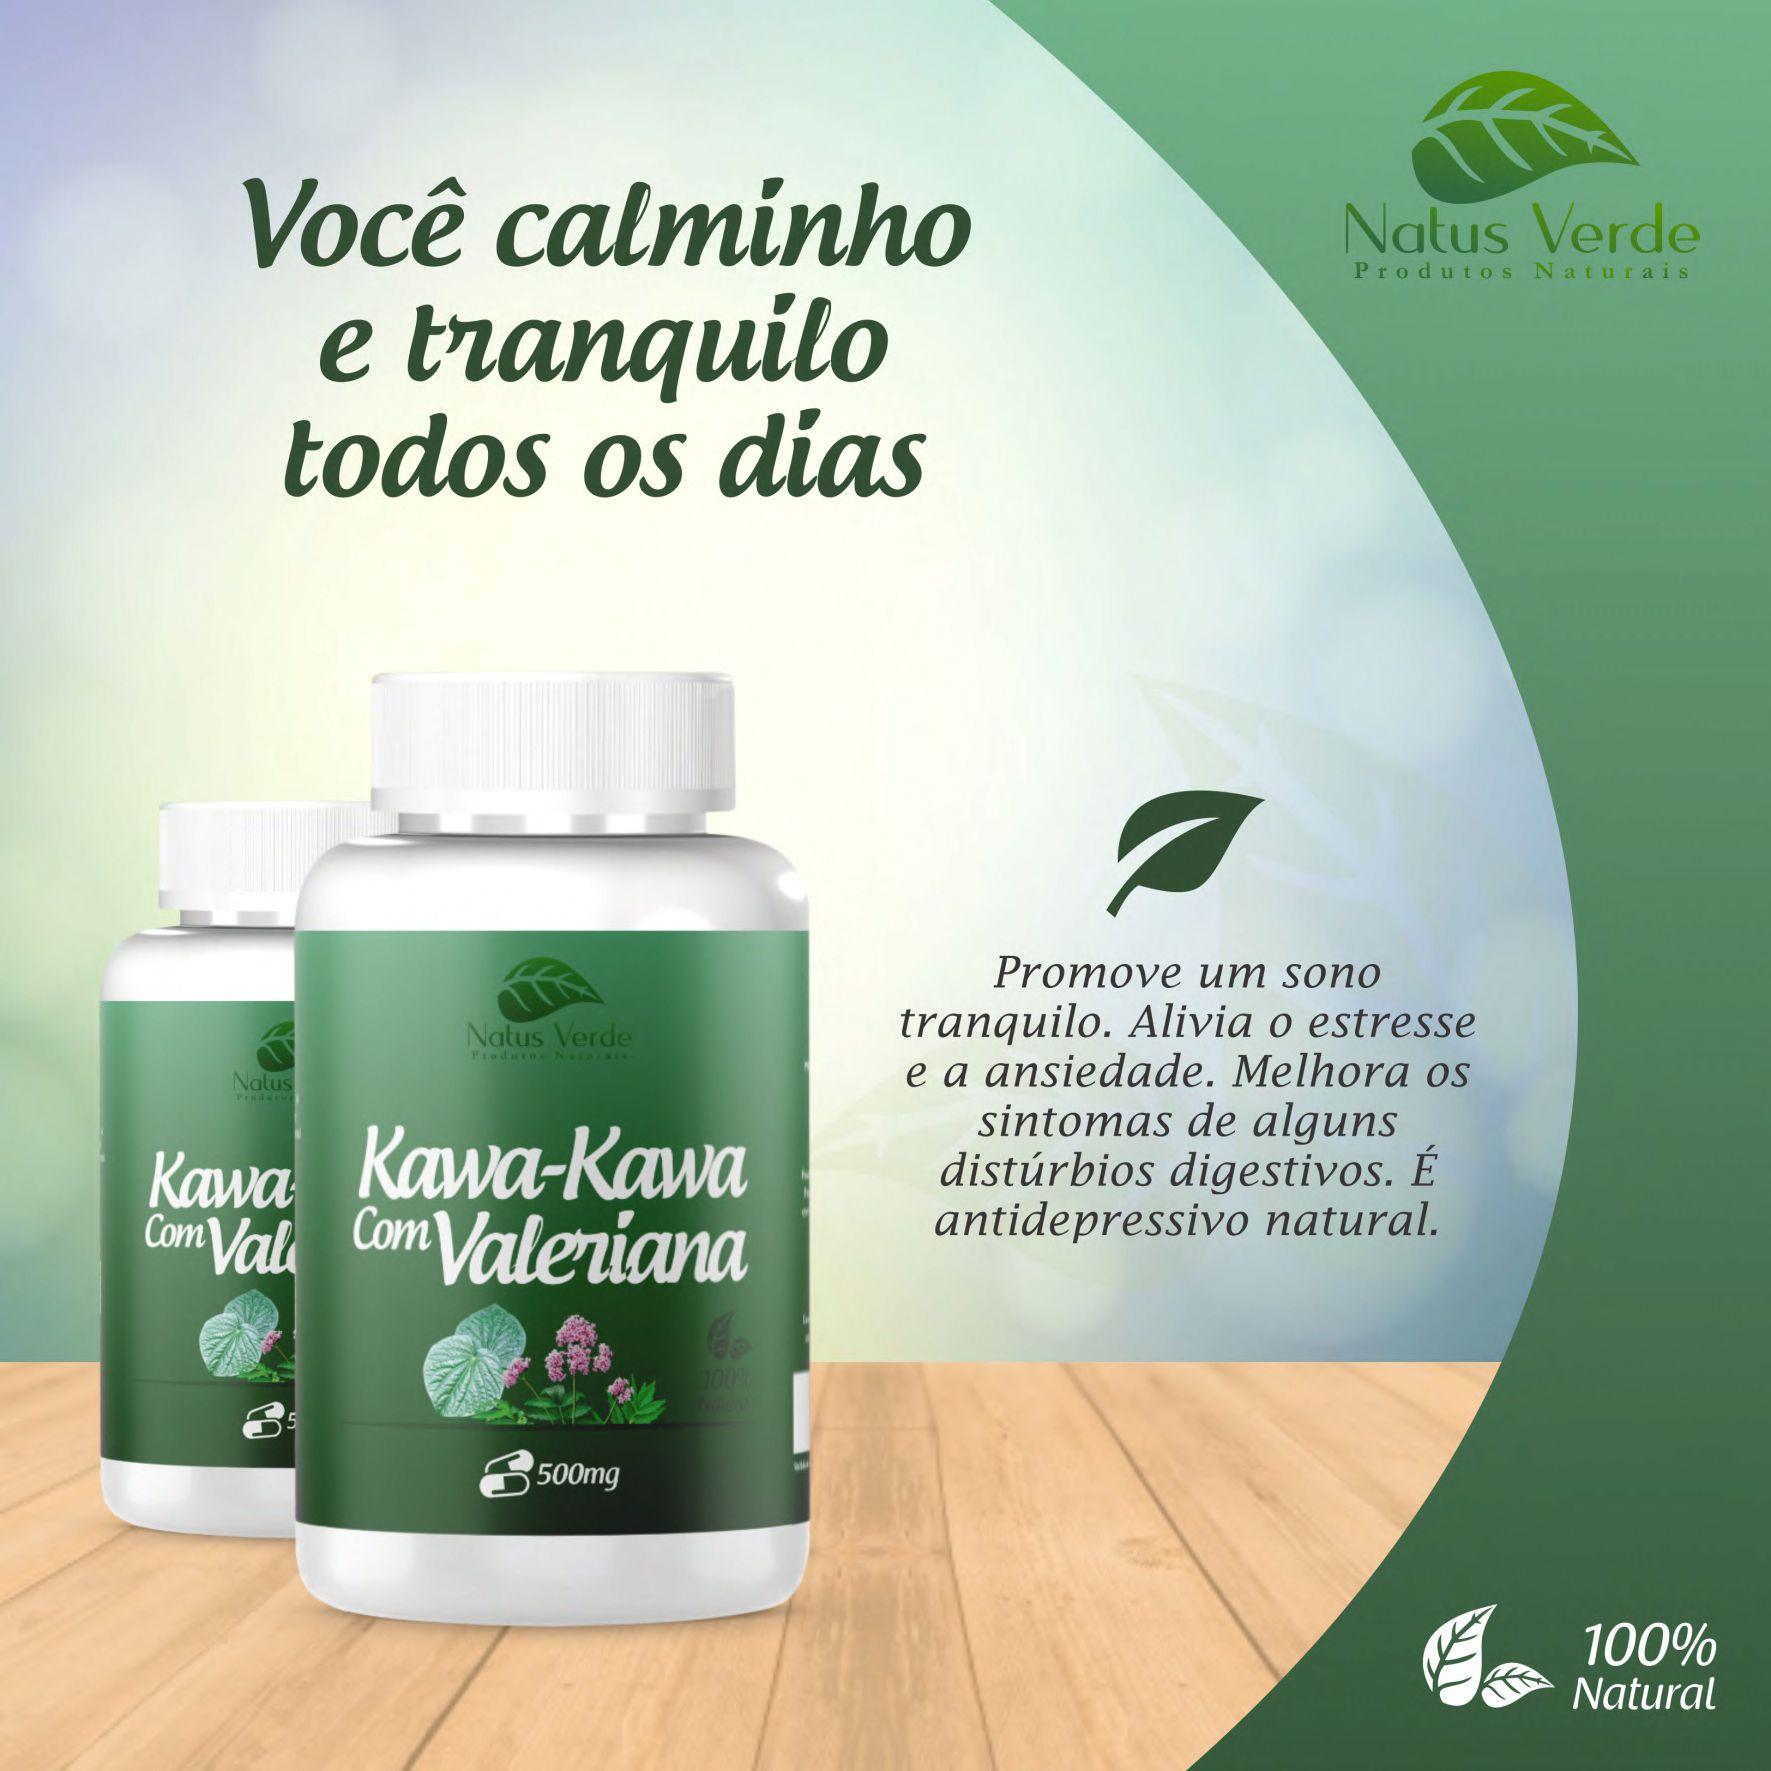 Composto natural Kawa-Kawa com Valeriana Natus Verdes  - Fribasex - Fabricasex.com